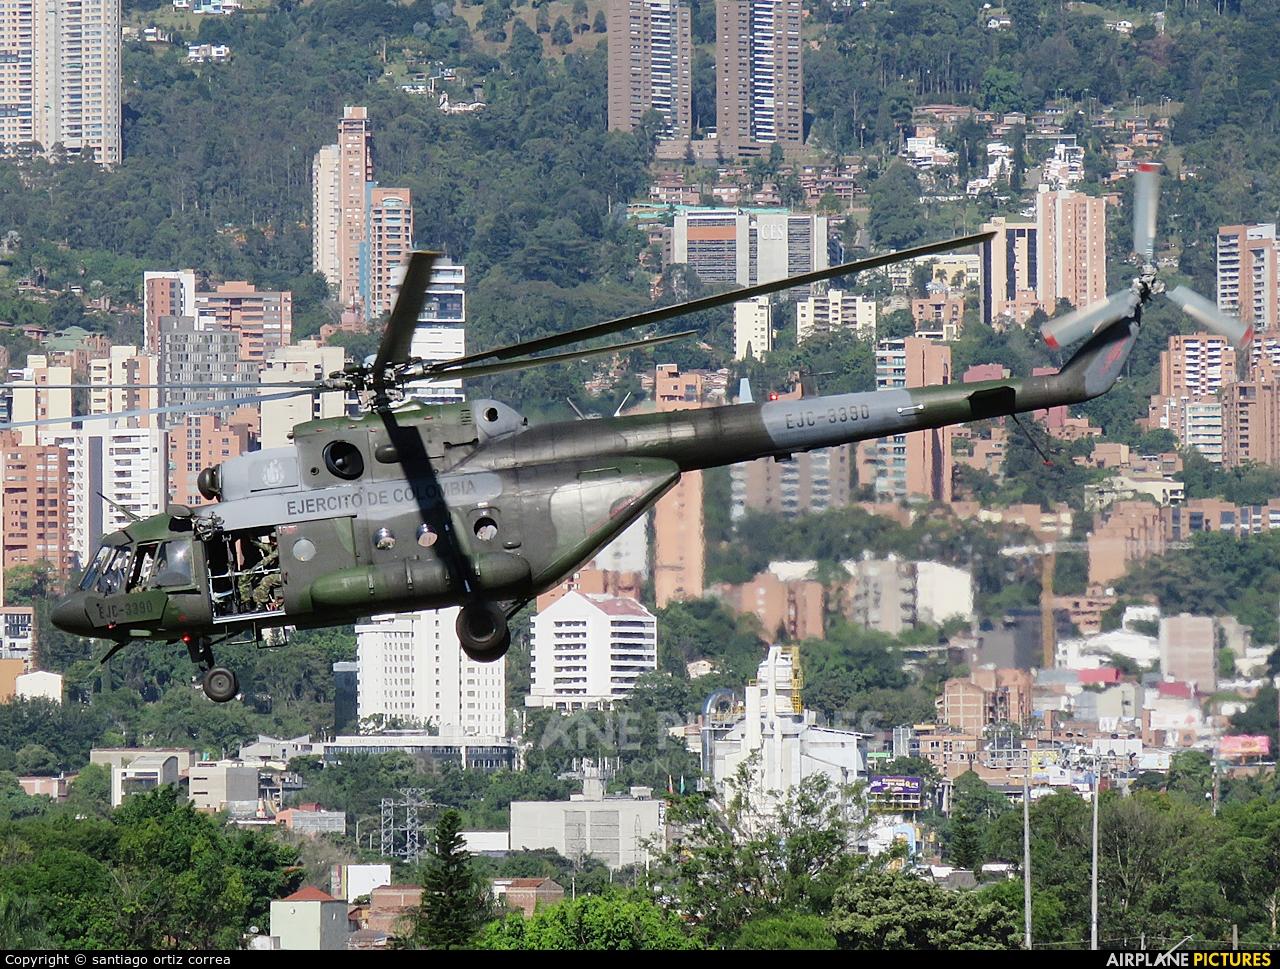 Colombia - Army EJC-3390 aircraft at Medellin - Olaya Herrera